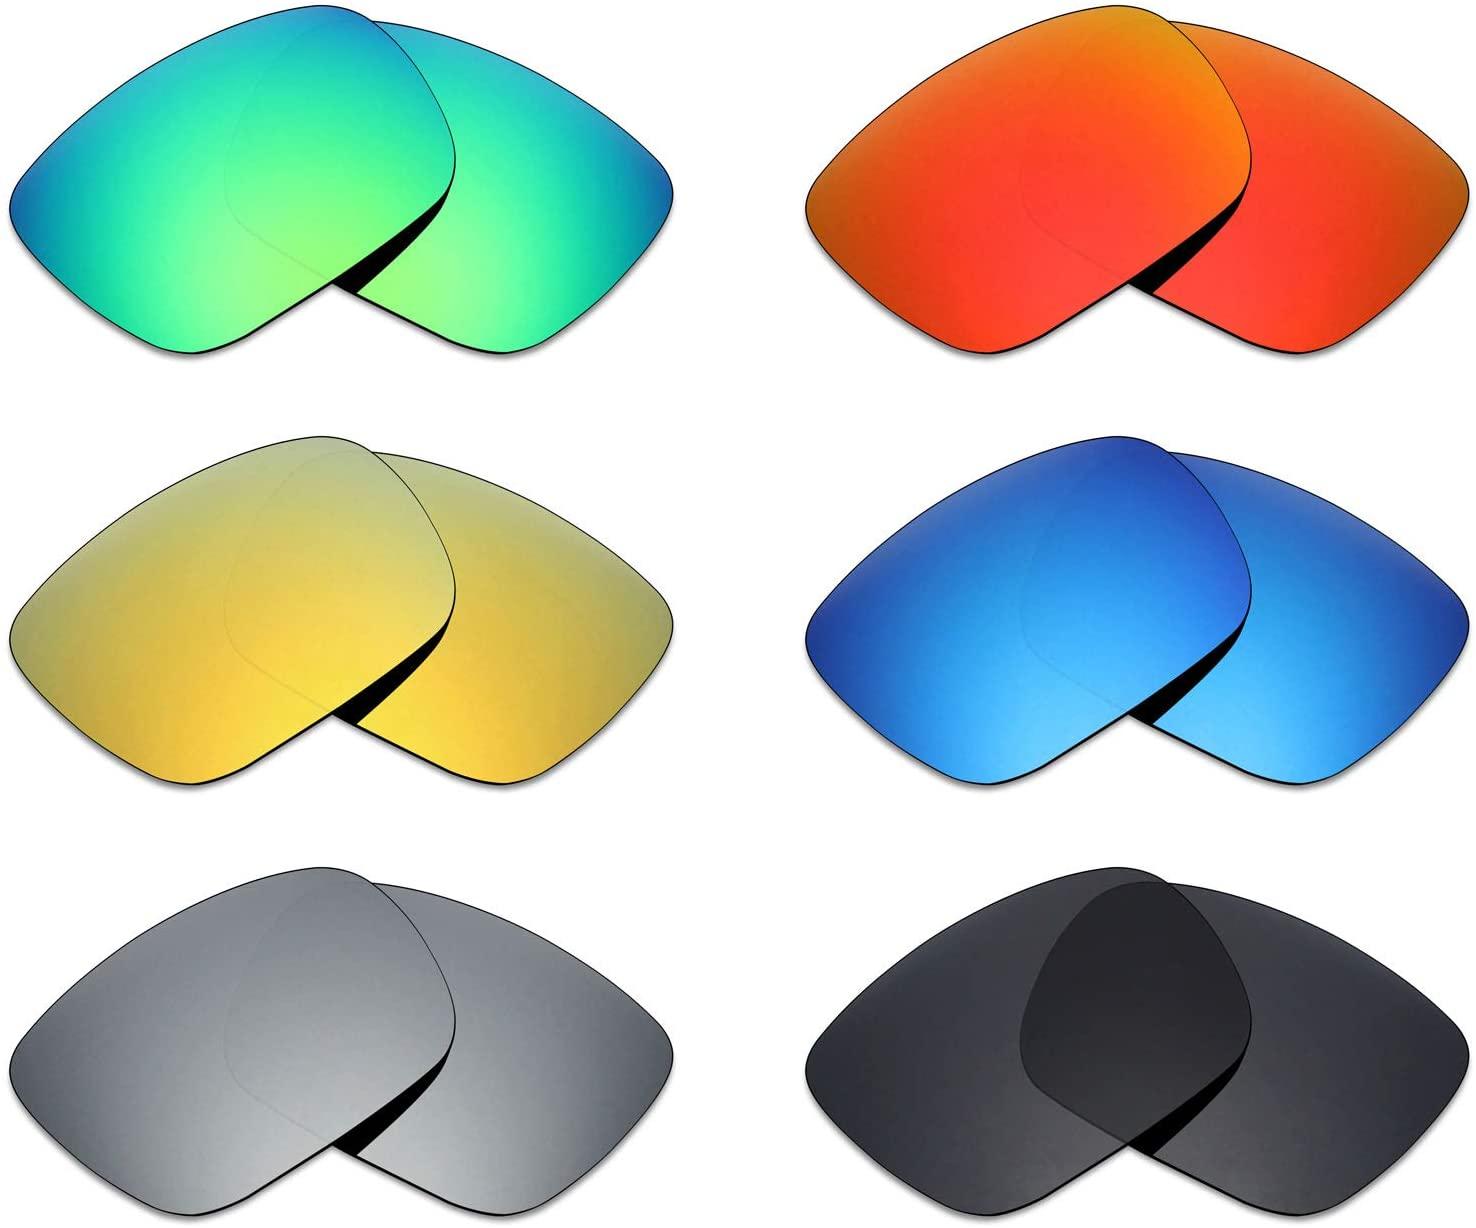 Mryok 6 Pair Polarized Replacement Lenses for Von Zipper Elmore Sunglass - Stealth Black/Fire Red/Ice Blue/Silver Titanium/Emerald Green/24K Gold